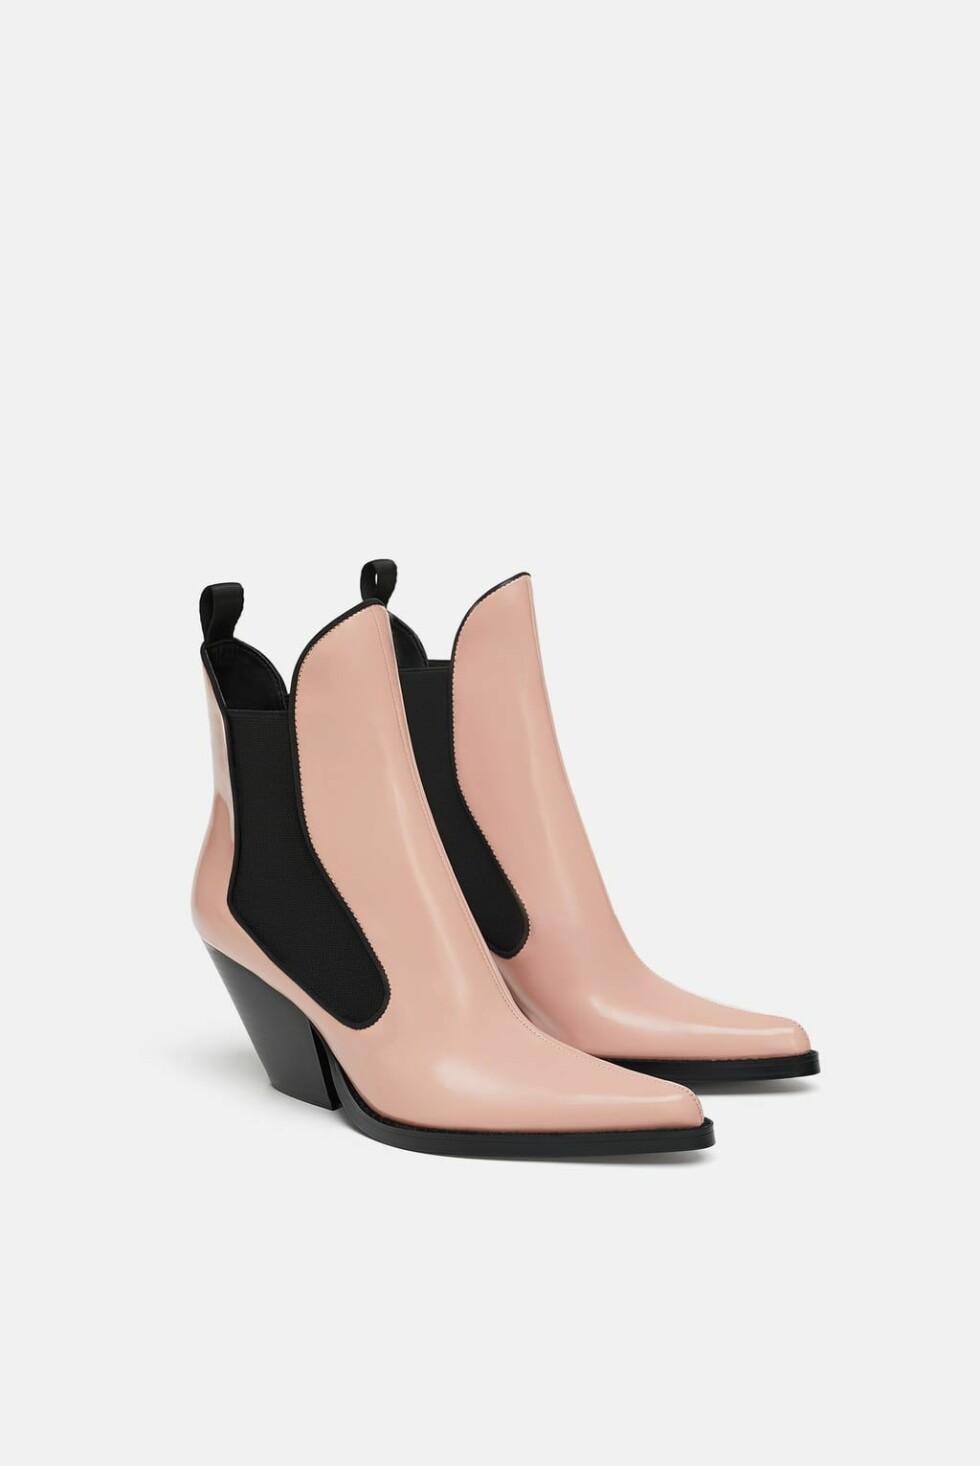 Boots fra Zara |700,-| https://www.zara.com/no/no/cowboyskolett-p17112301.html?v1=6682507&v2=1074625